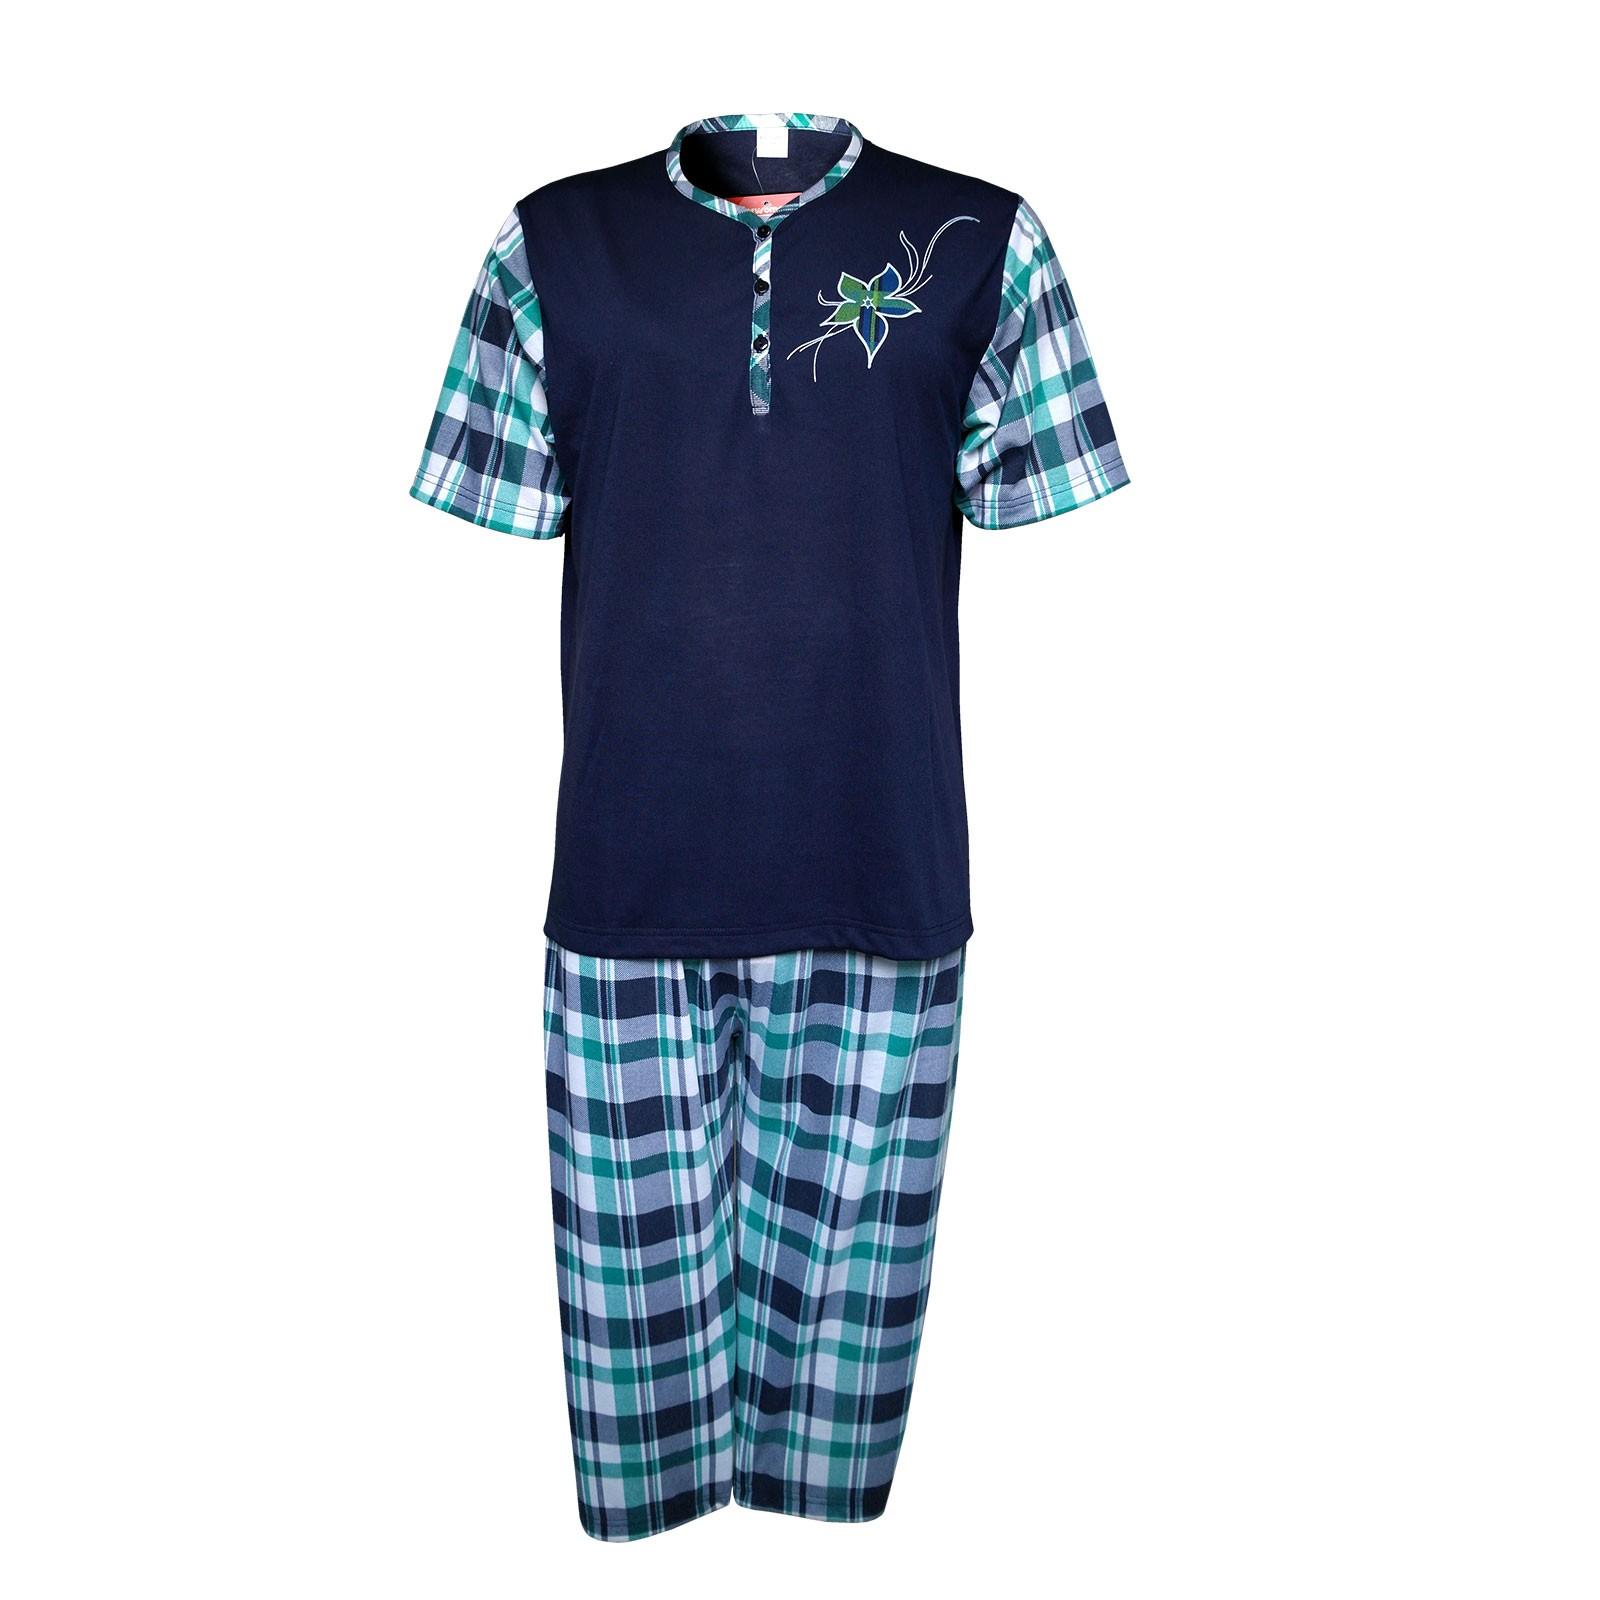 Kurzarm Damen Capri-Schlafanzug im Karolook 100% Baumwolle - Top modische Farben Dunkelblau